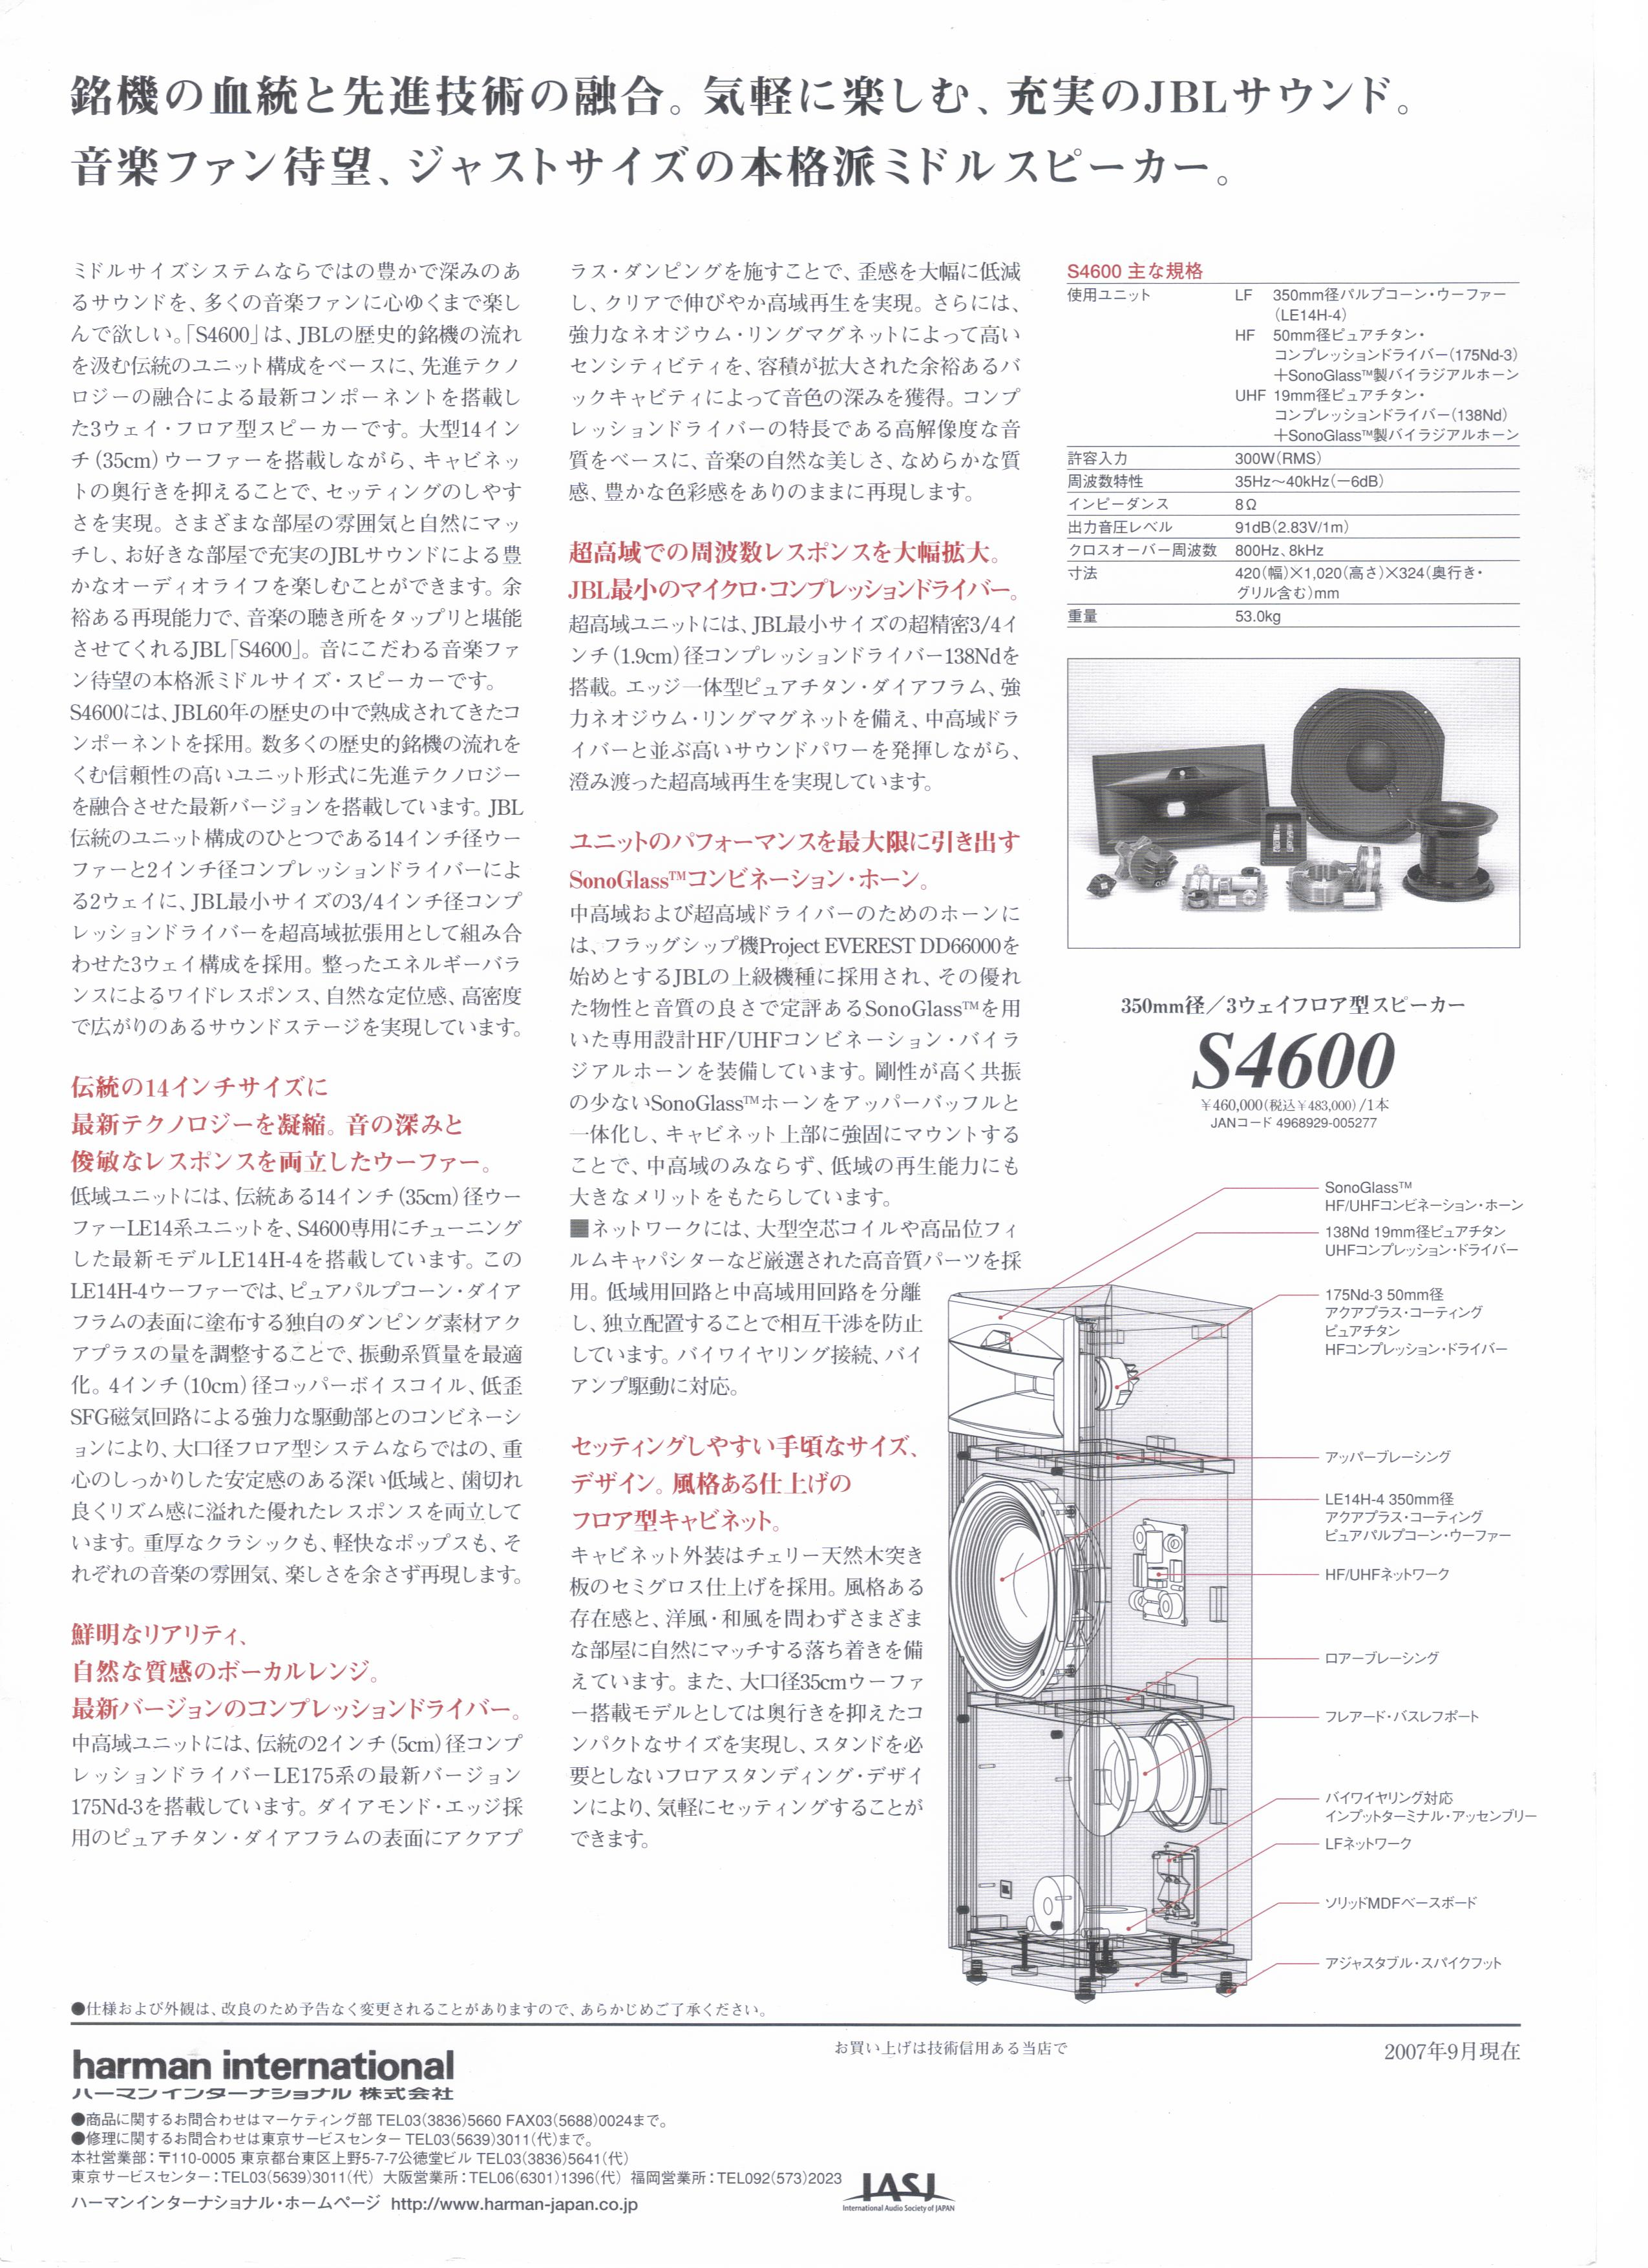 Serie K2 S4600 1011101042501207127093759